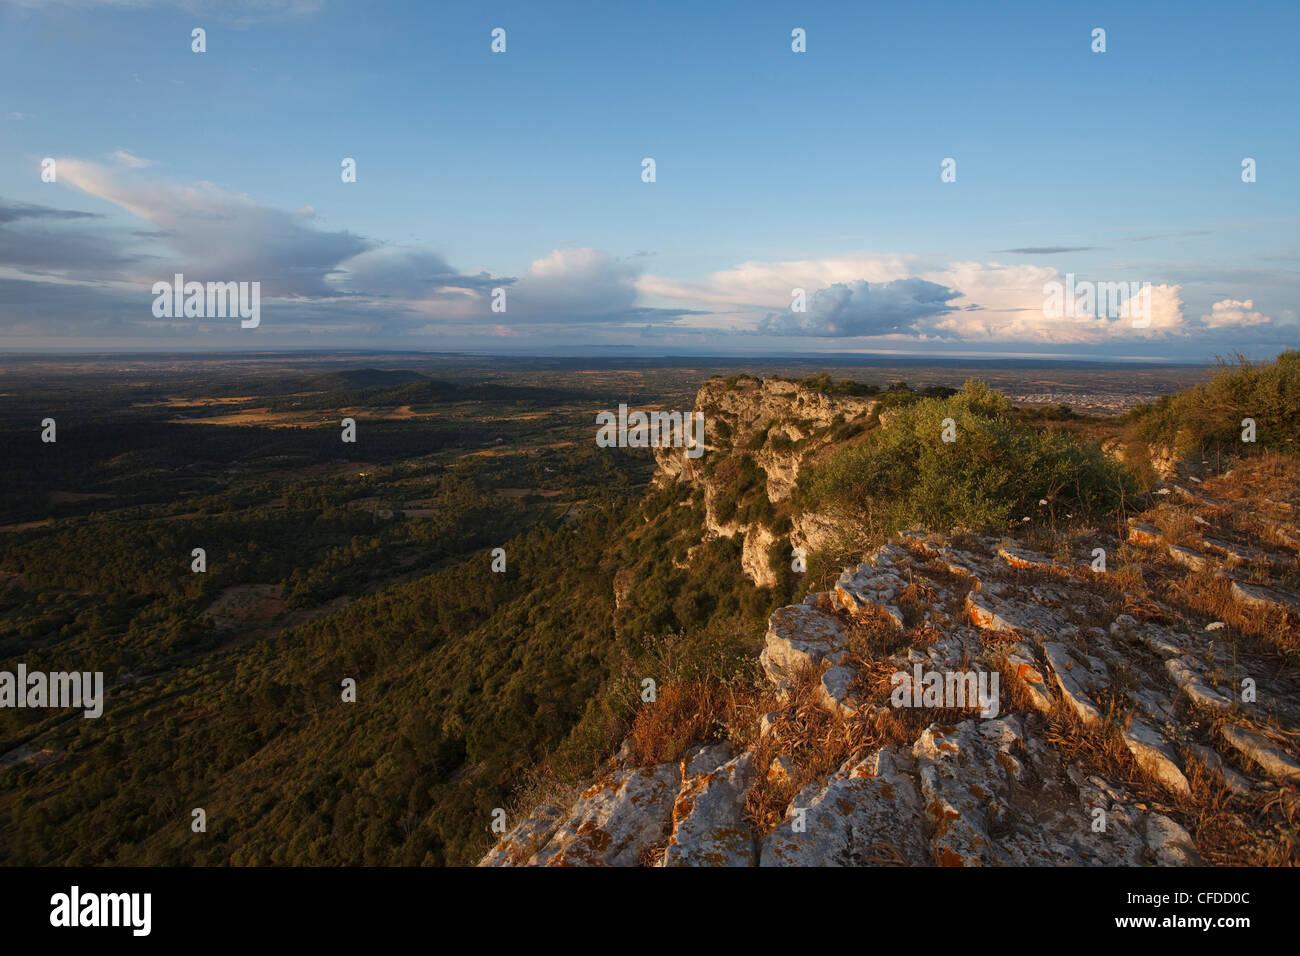 View from Puig de Randa, mountain with monastries, near Llucmayor, plain Es Pla, Mallorca, Balearic Islands, Spain, - Stock Image